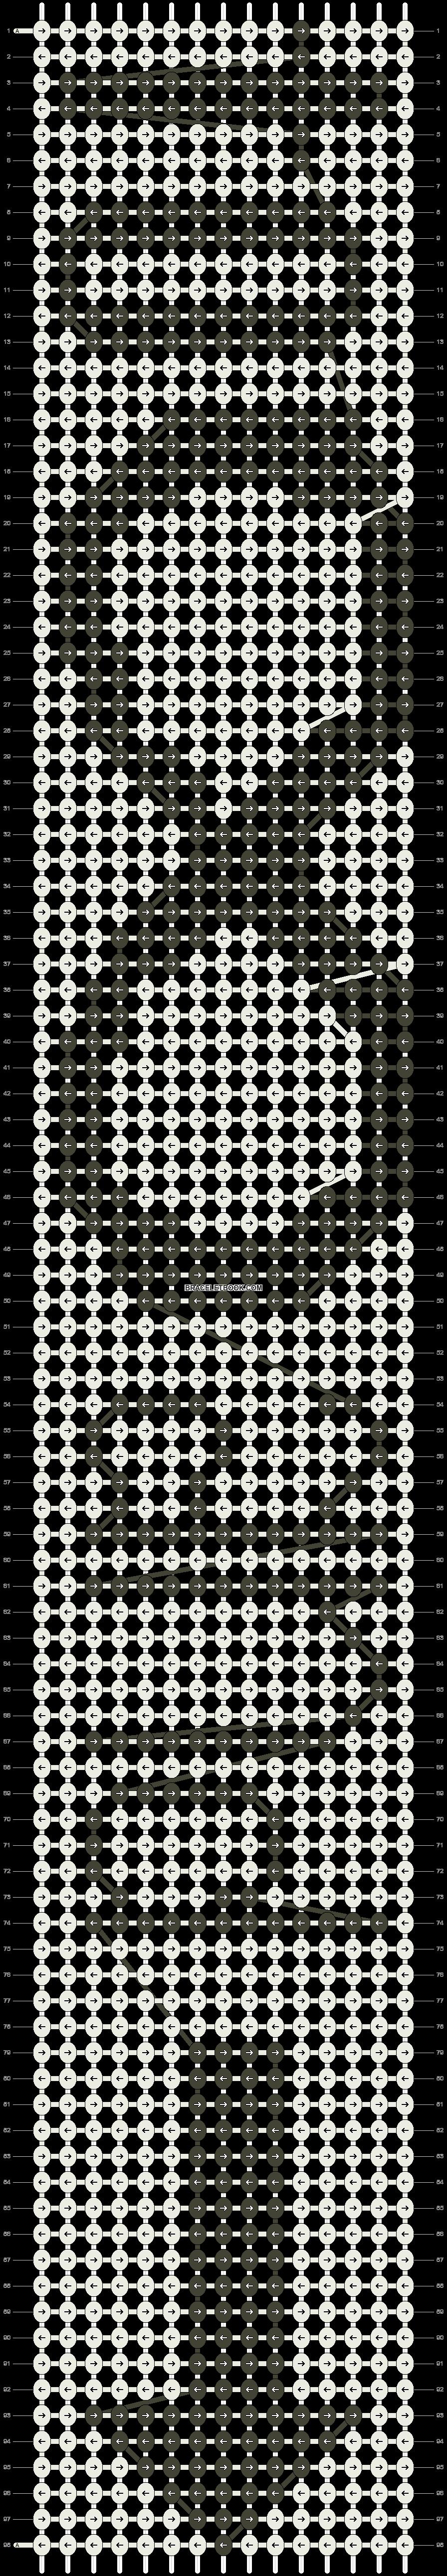 Alpha pattern #5907 pattern